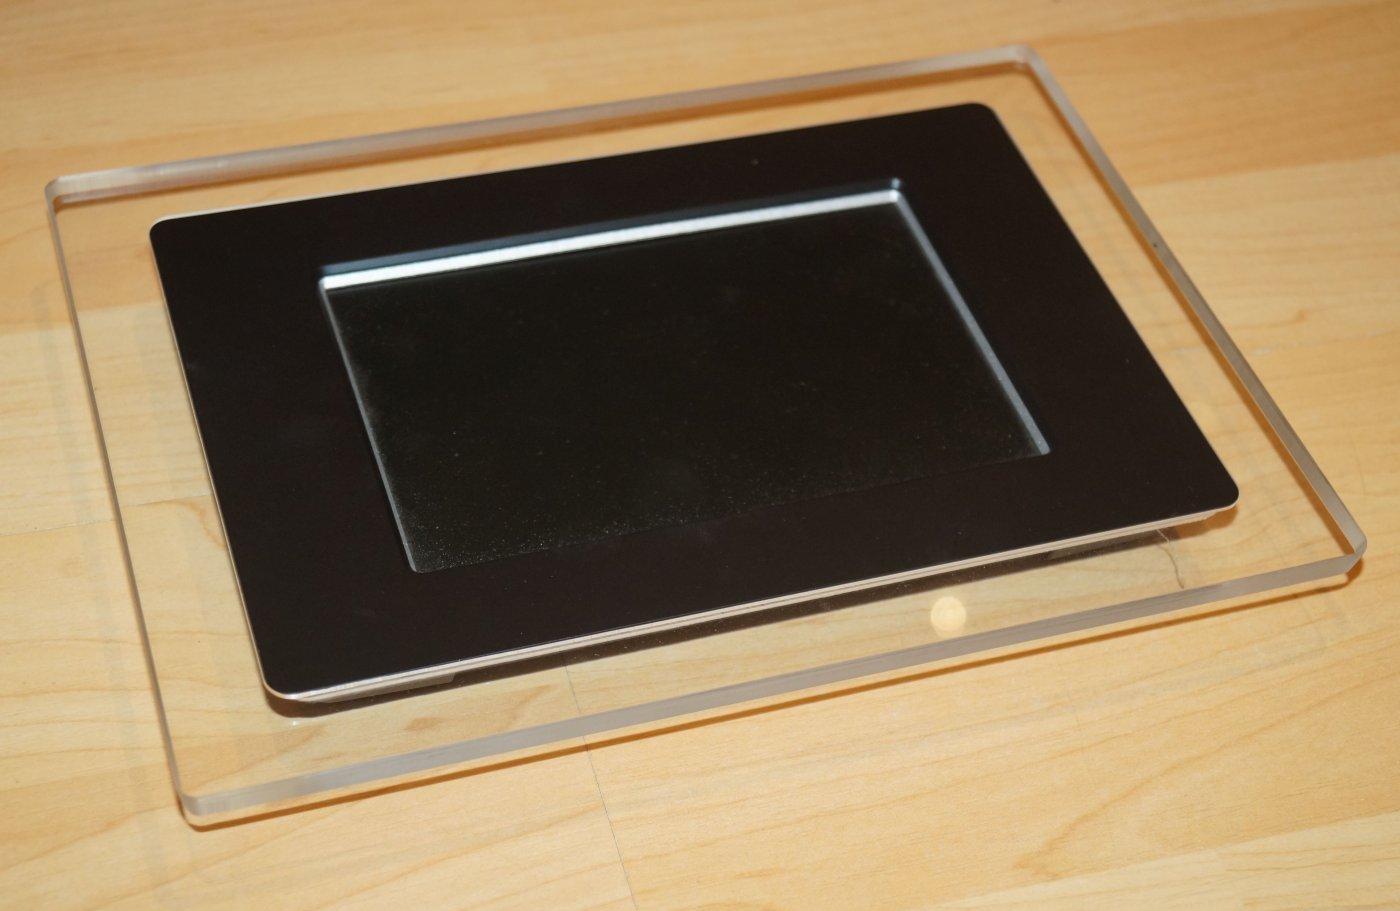 digitaler 7 zoll bilderrahmen aiptek picasso ebay. Black Bedroom Furniture Sets. Home Design Ideas